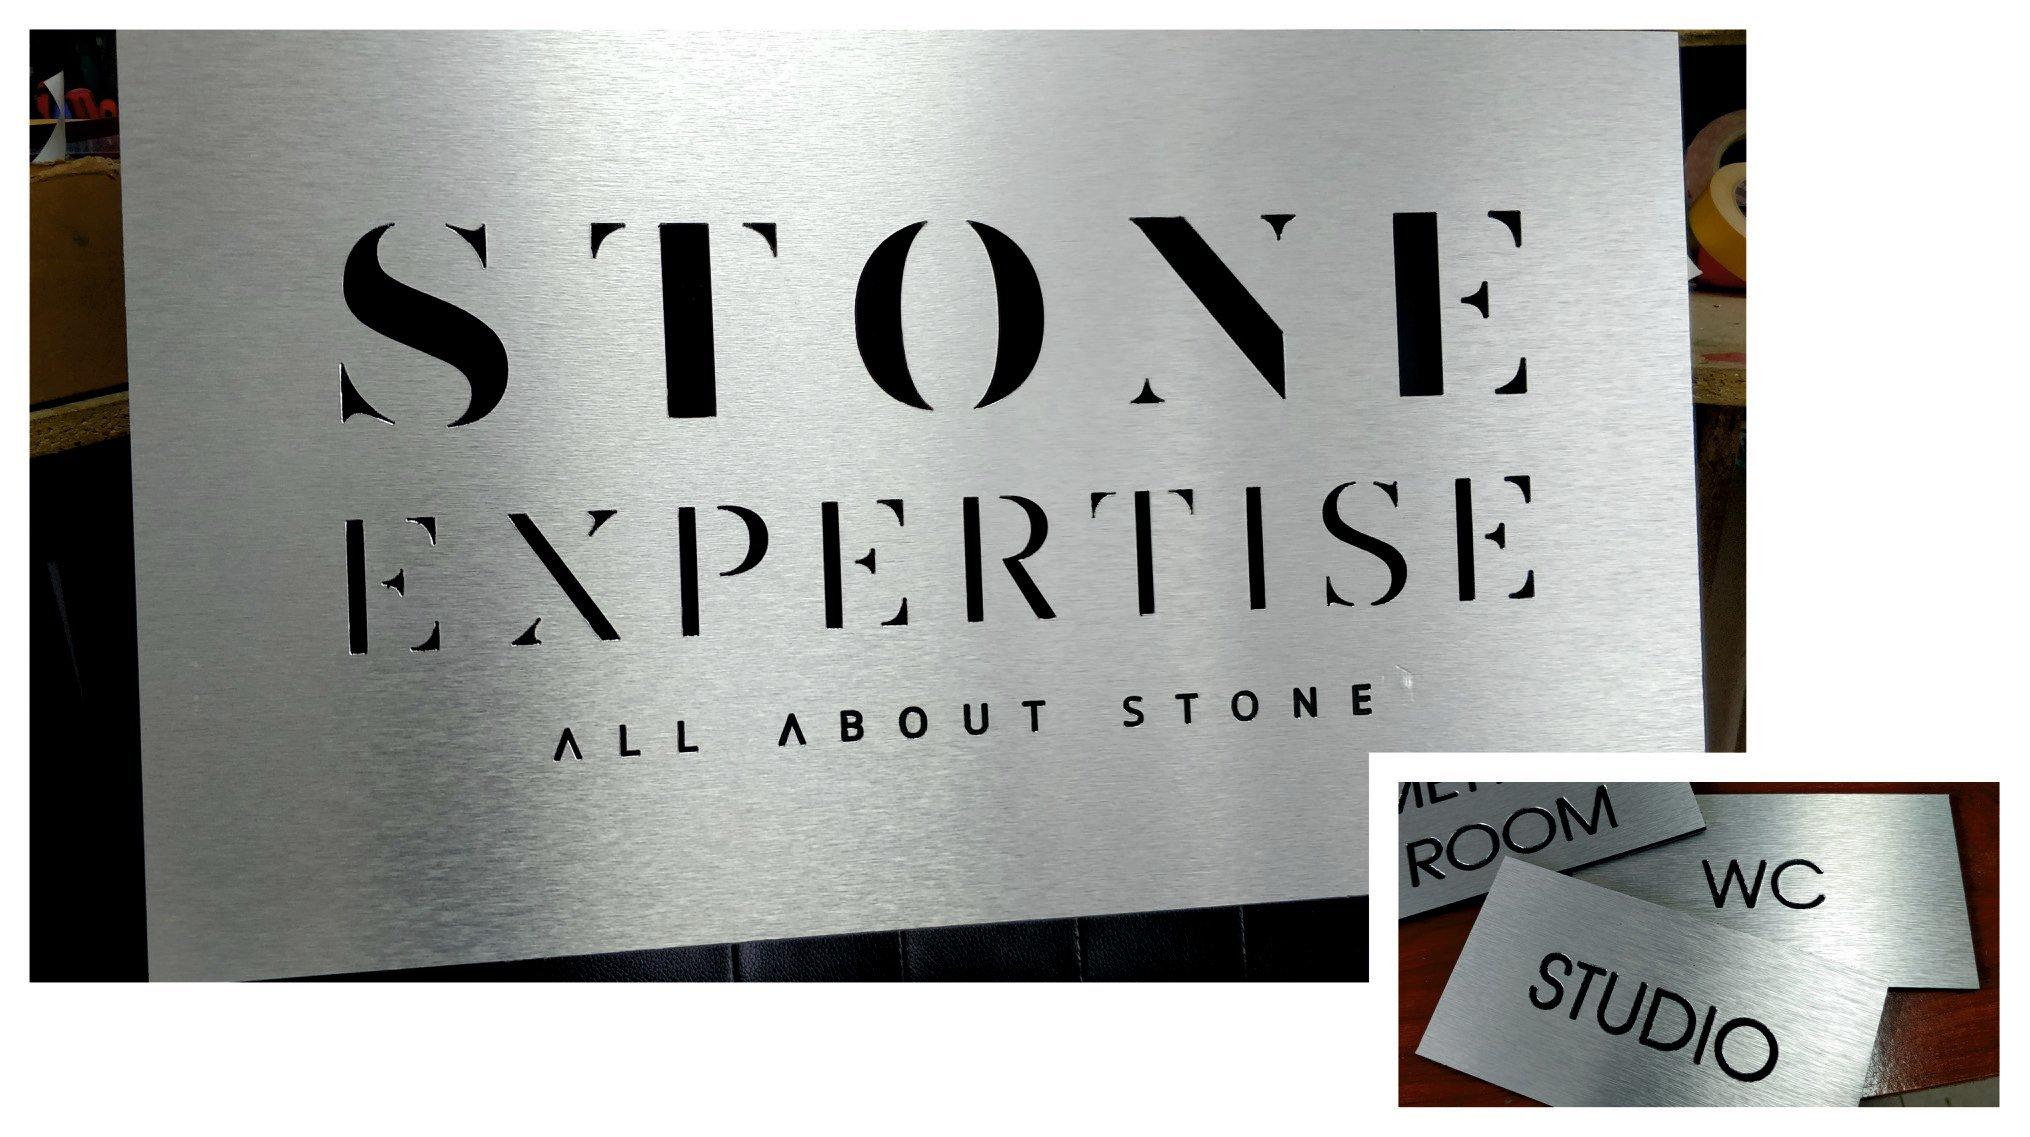 gravacao cnc stone expertise